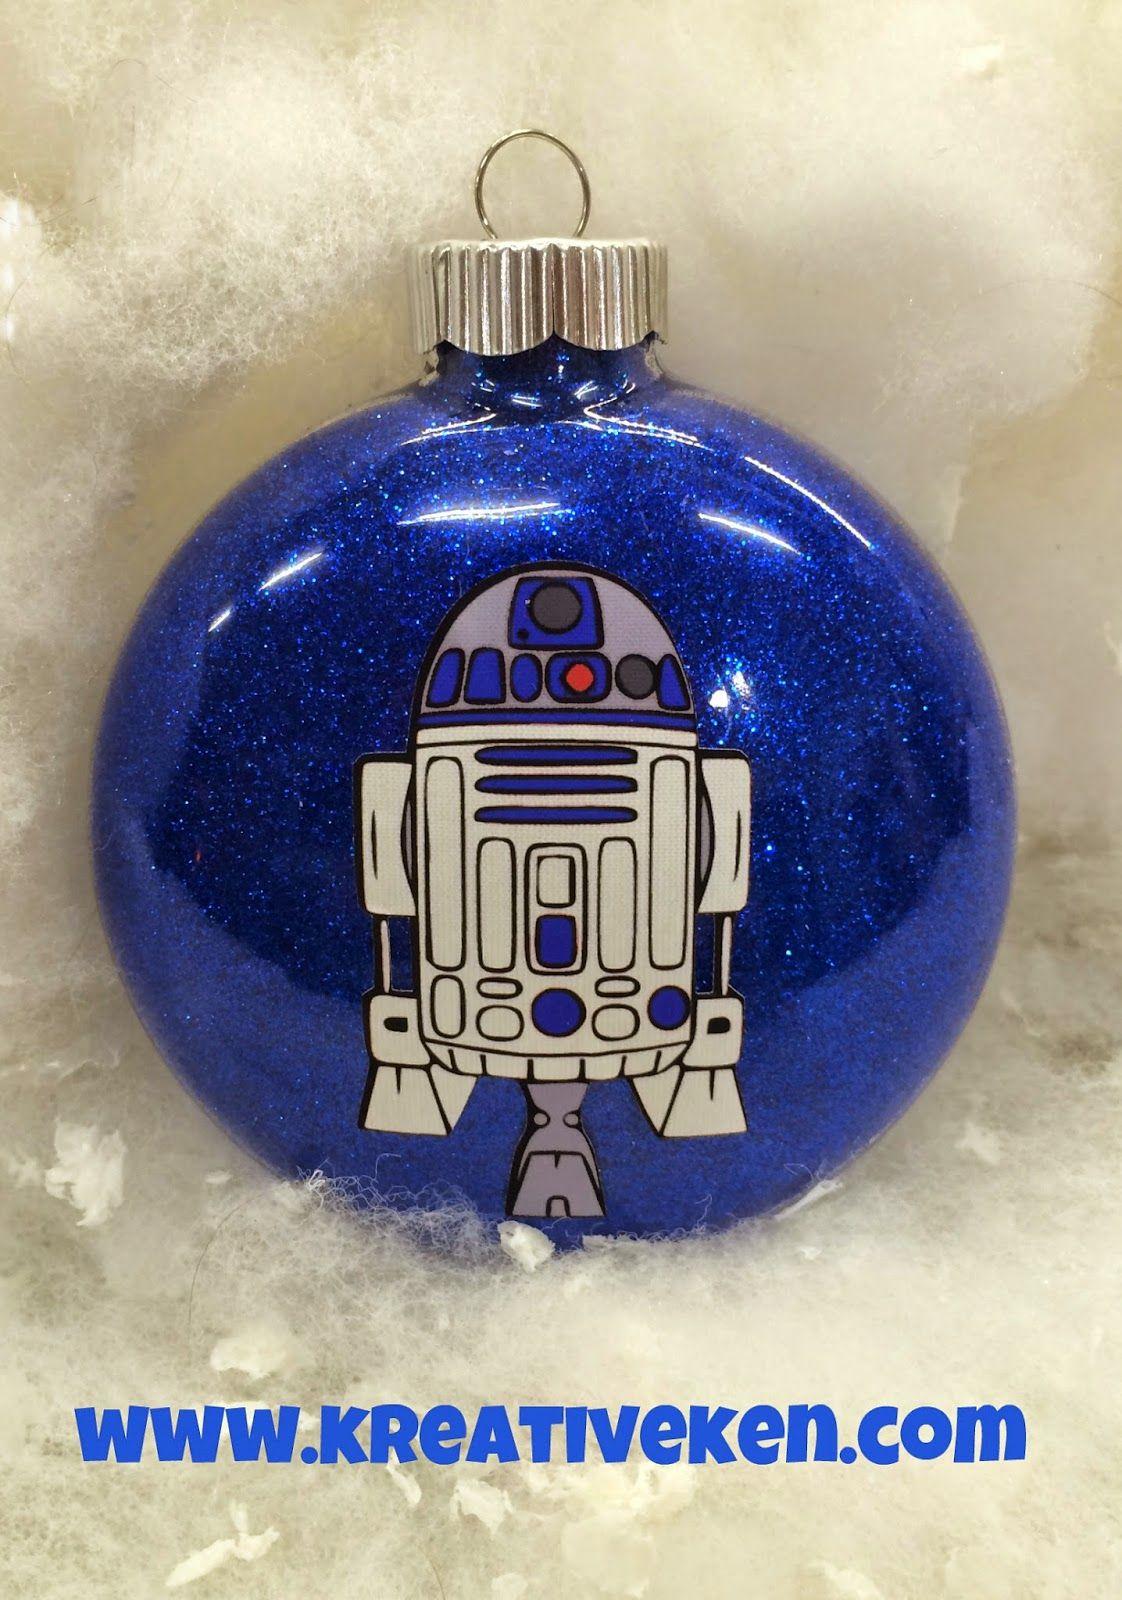 Star Wars Ornaments Ken S Kreations Star Wars Christmas Ornaments Star Wars Christmas Tree Star Wars Christmas